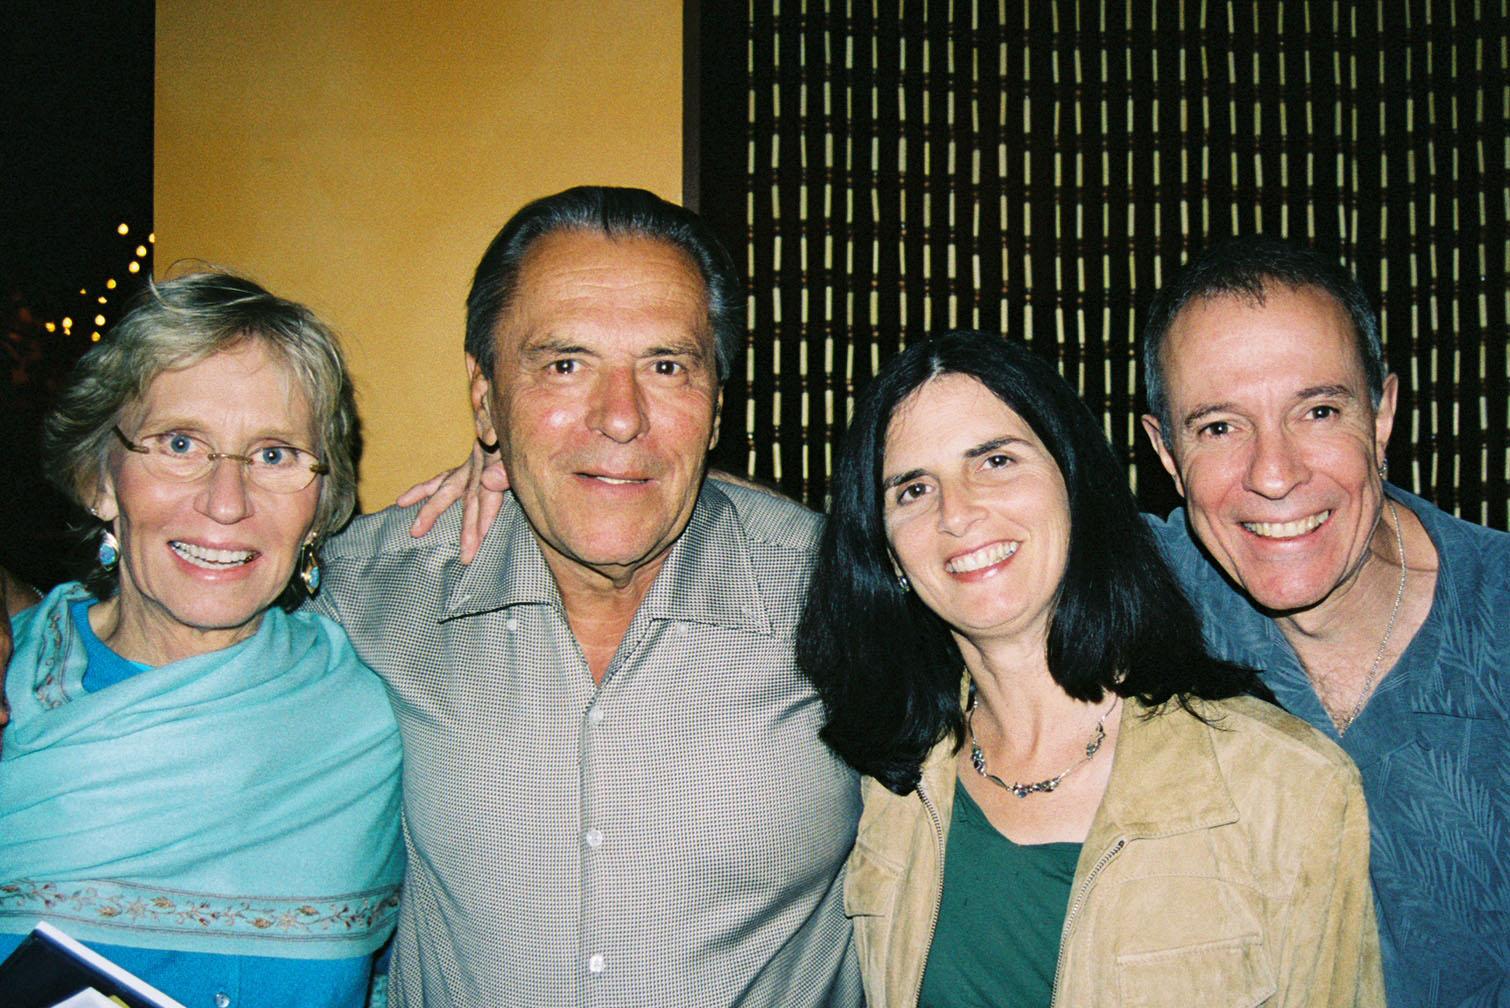 Christina and Stan Grof, Cary and Tav Sparks